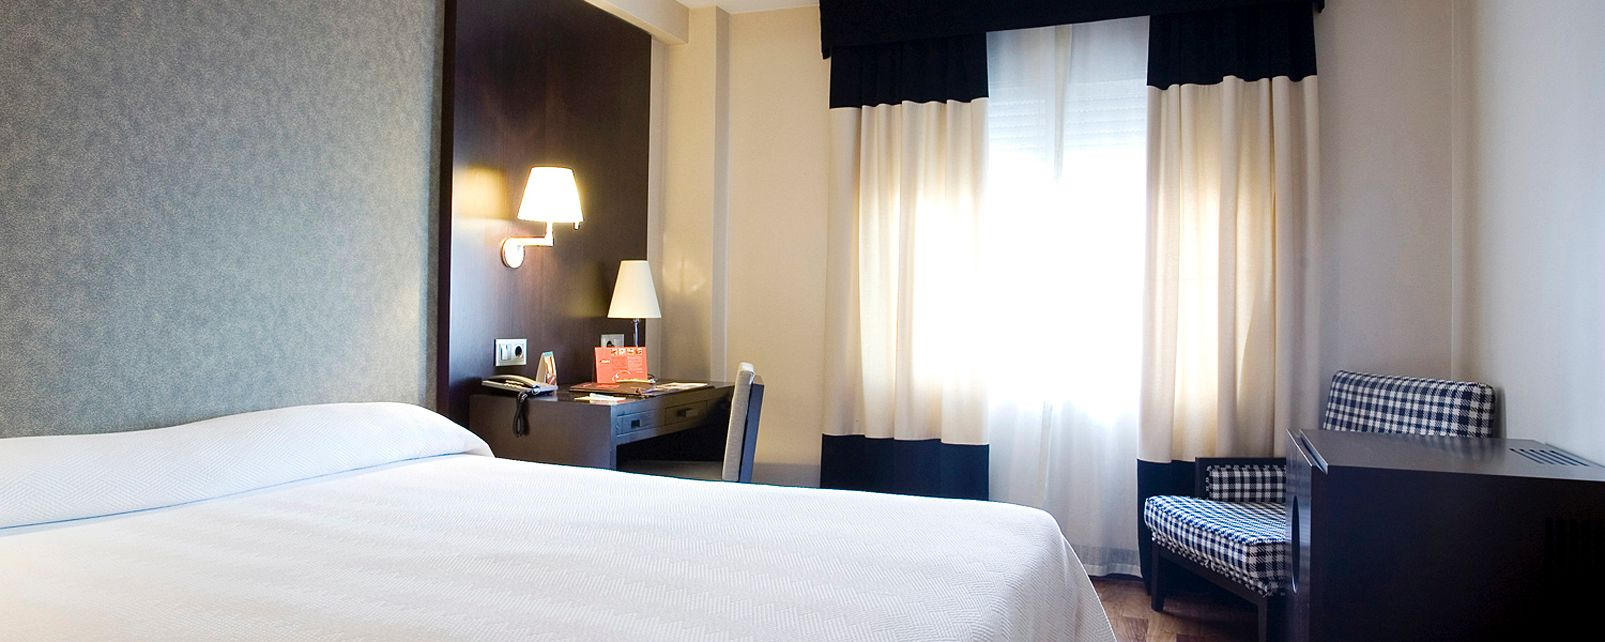 Hotel NH Balboa